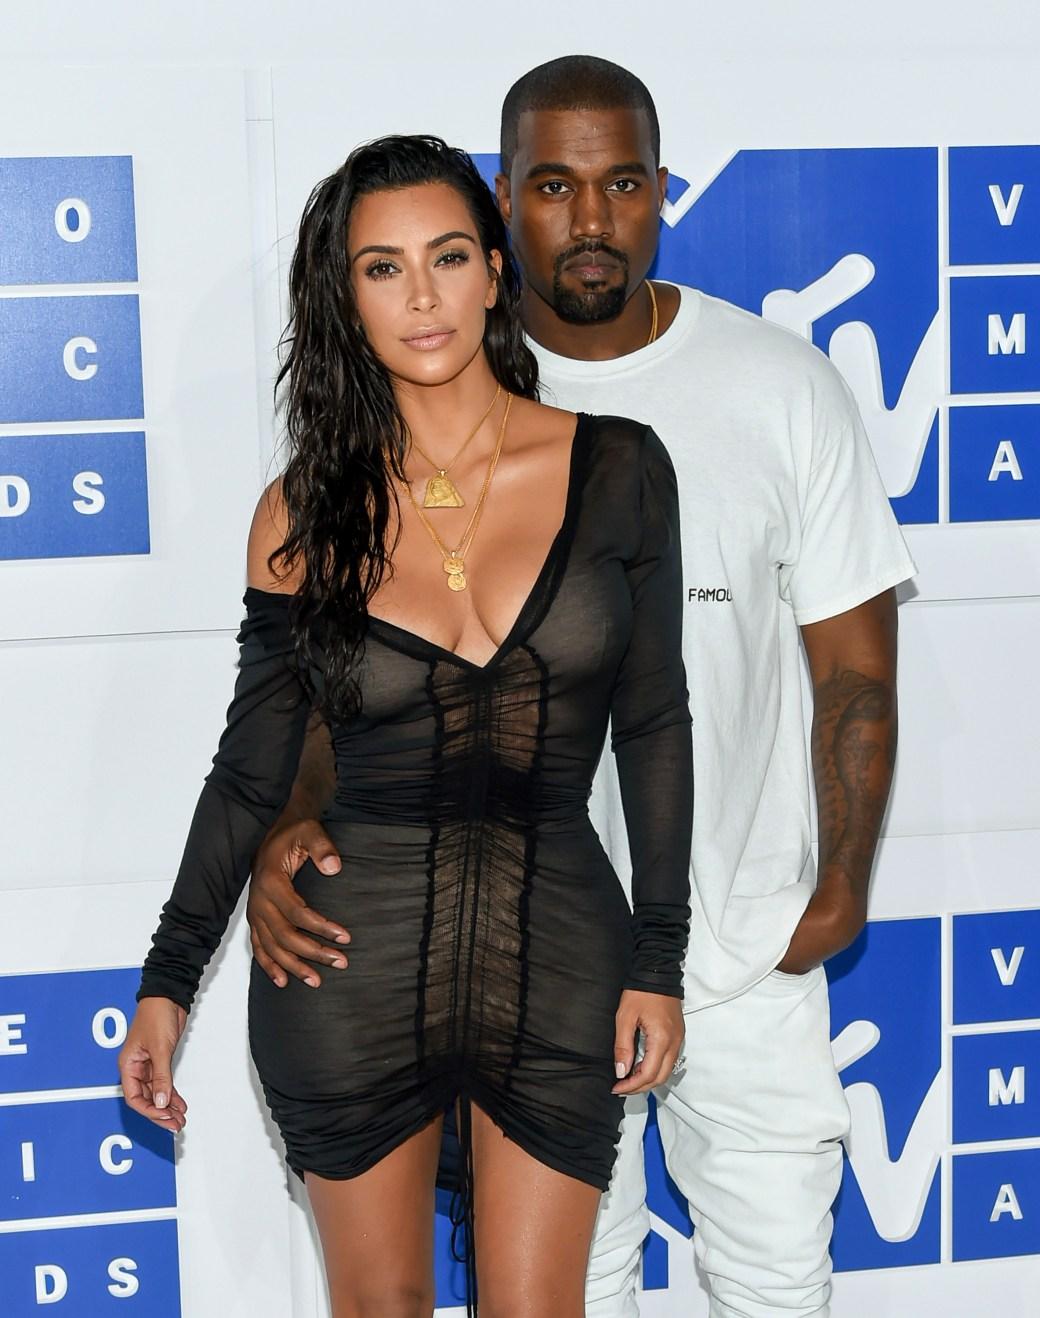 Kim Kardashian y Kanye West se casaron en mayo del 2014 (Foto: Evan Agostini/Invision/AP)